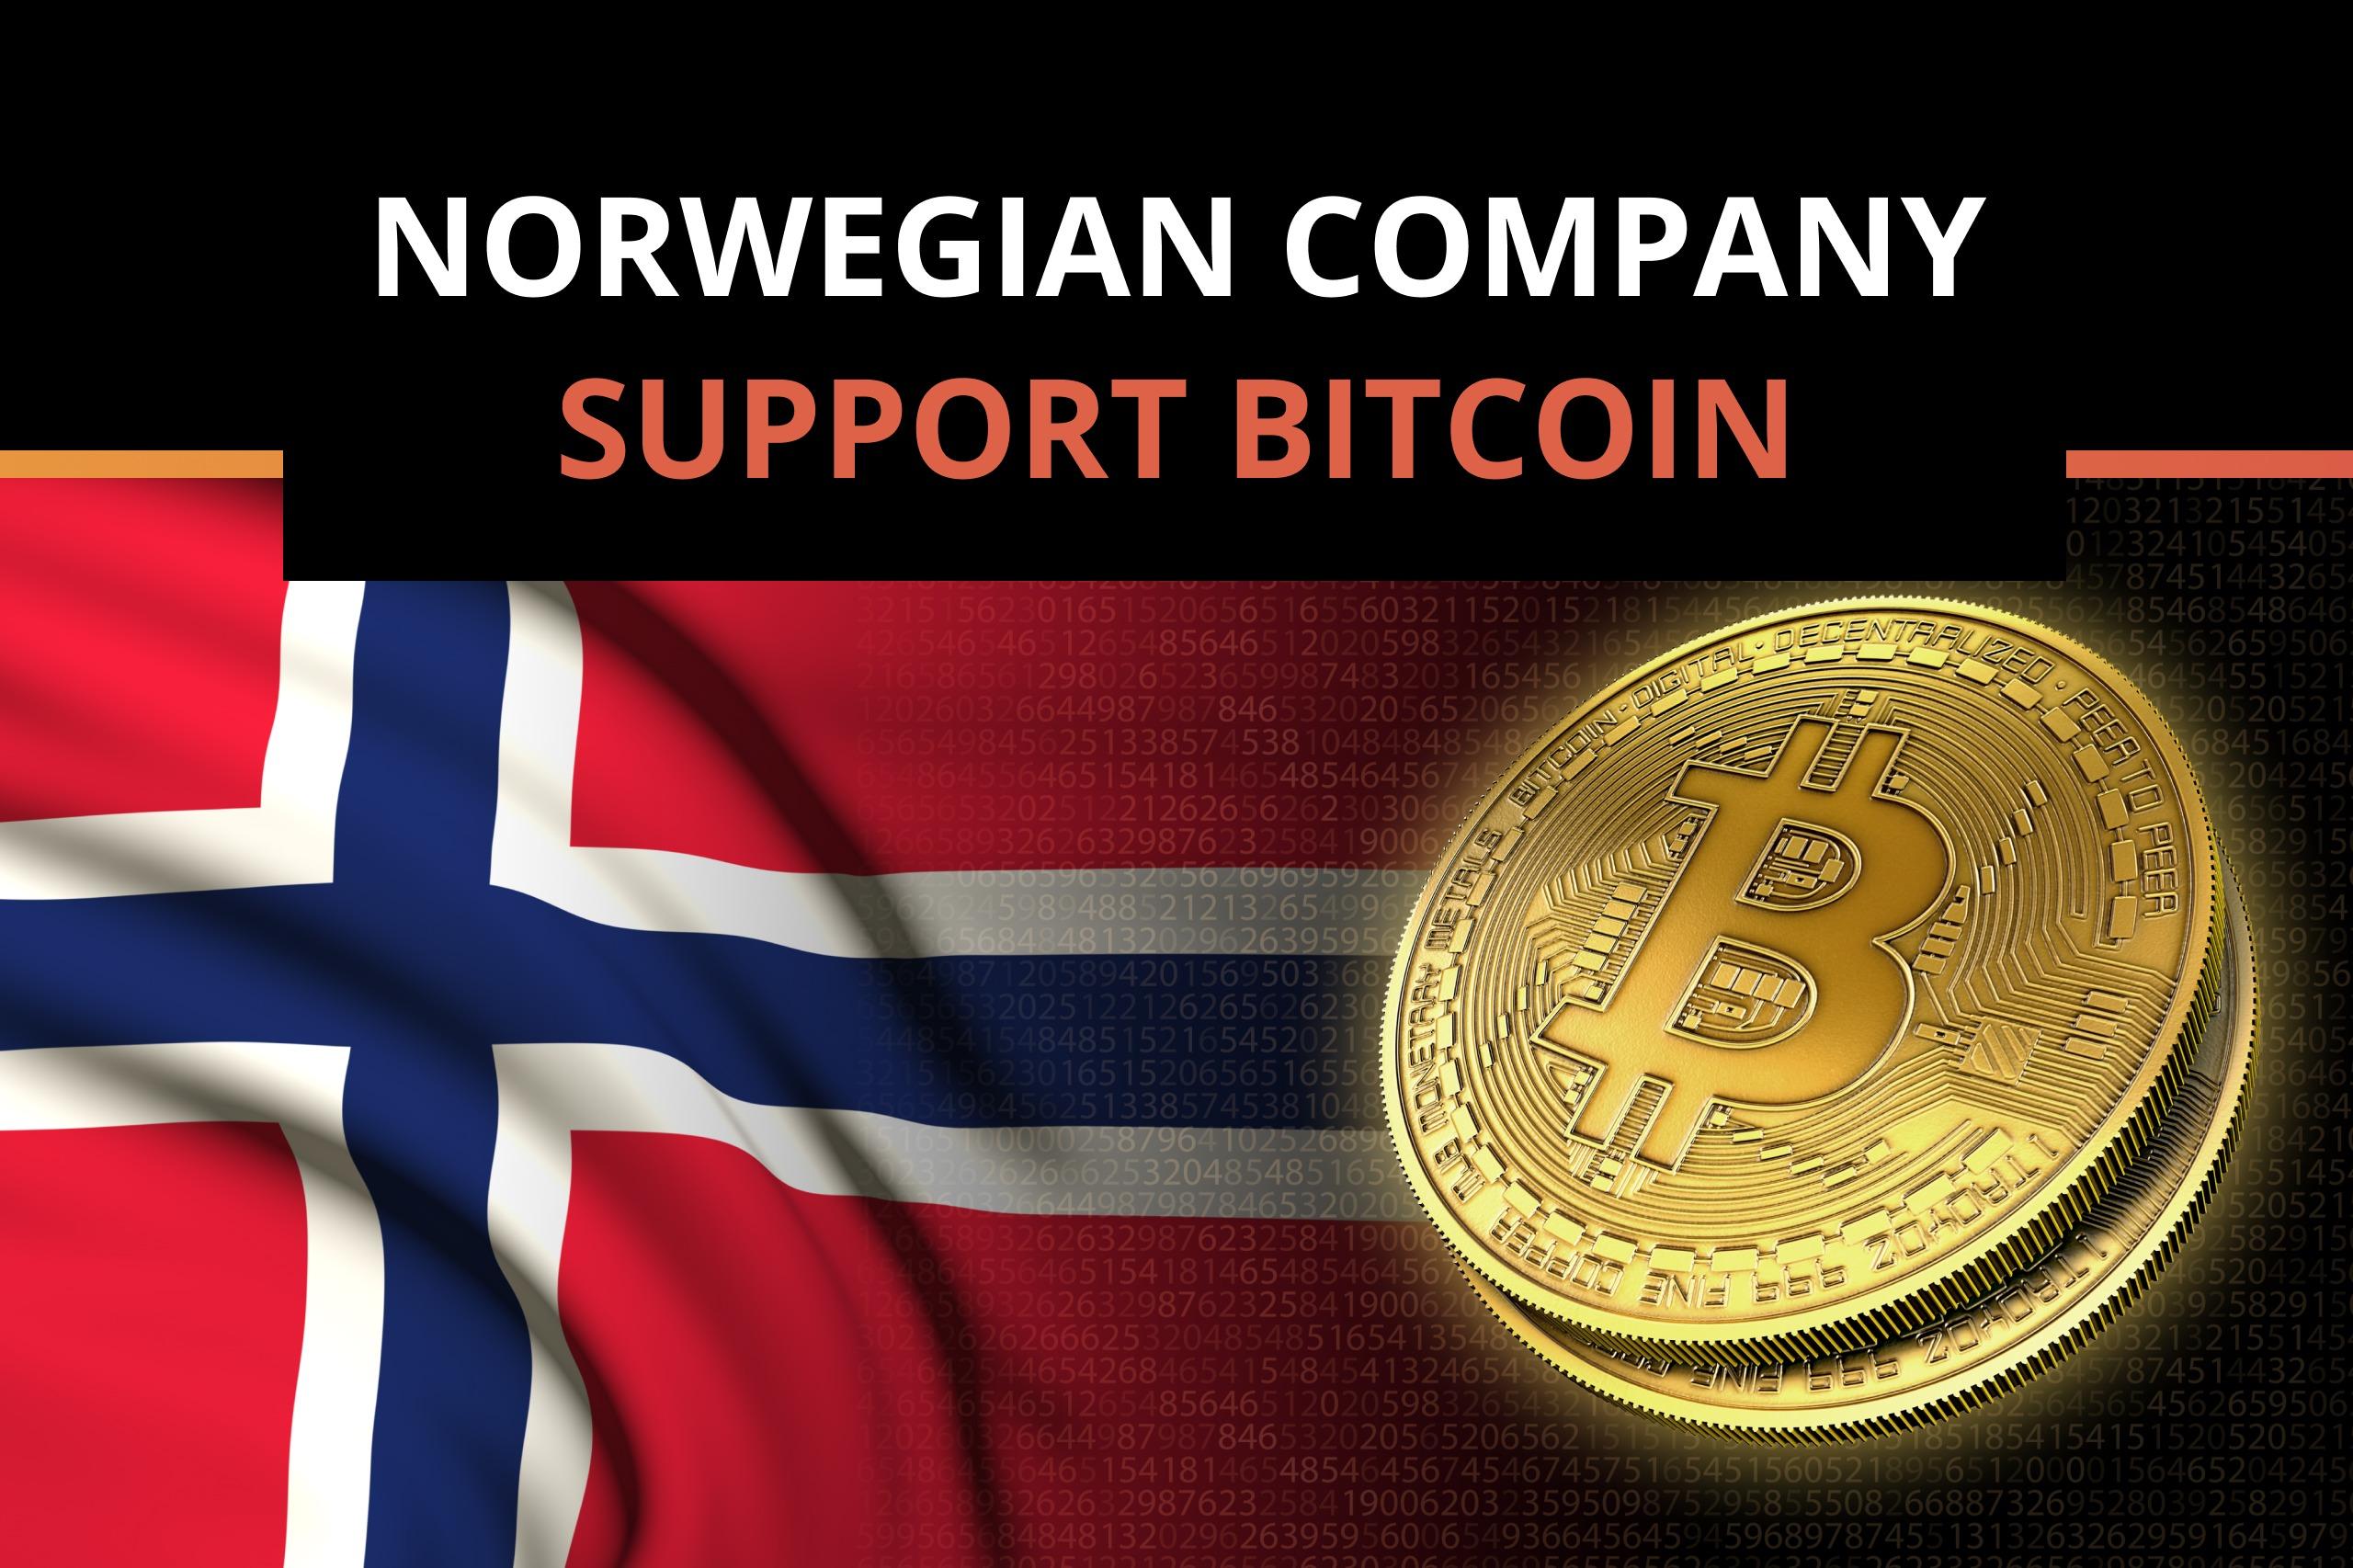 Norwegian Billionaire Supports Bitcoin